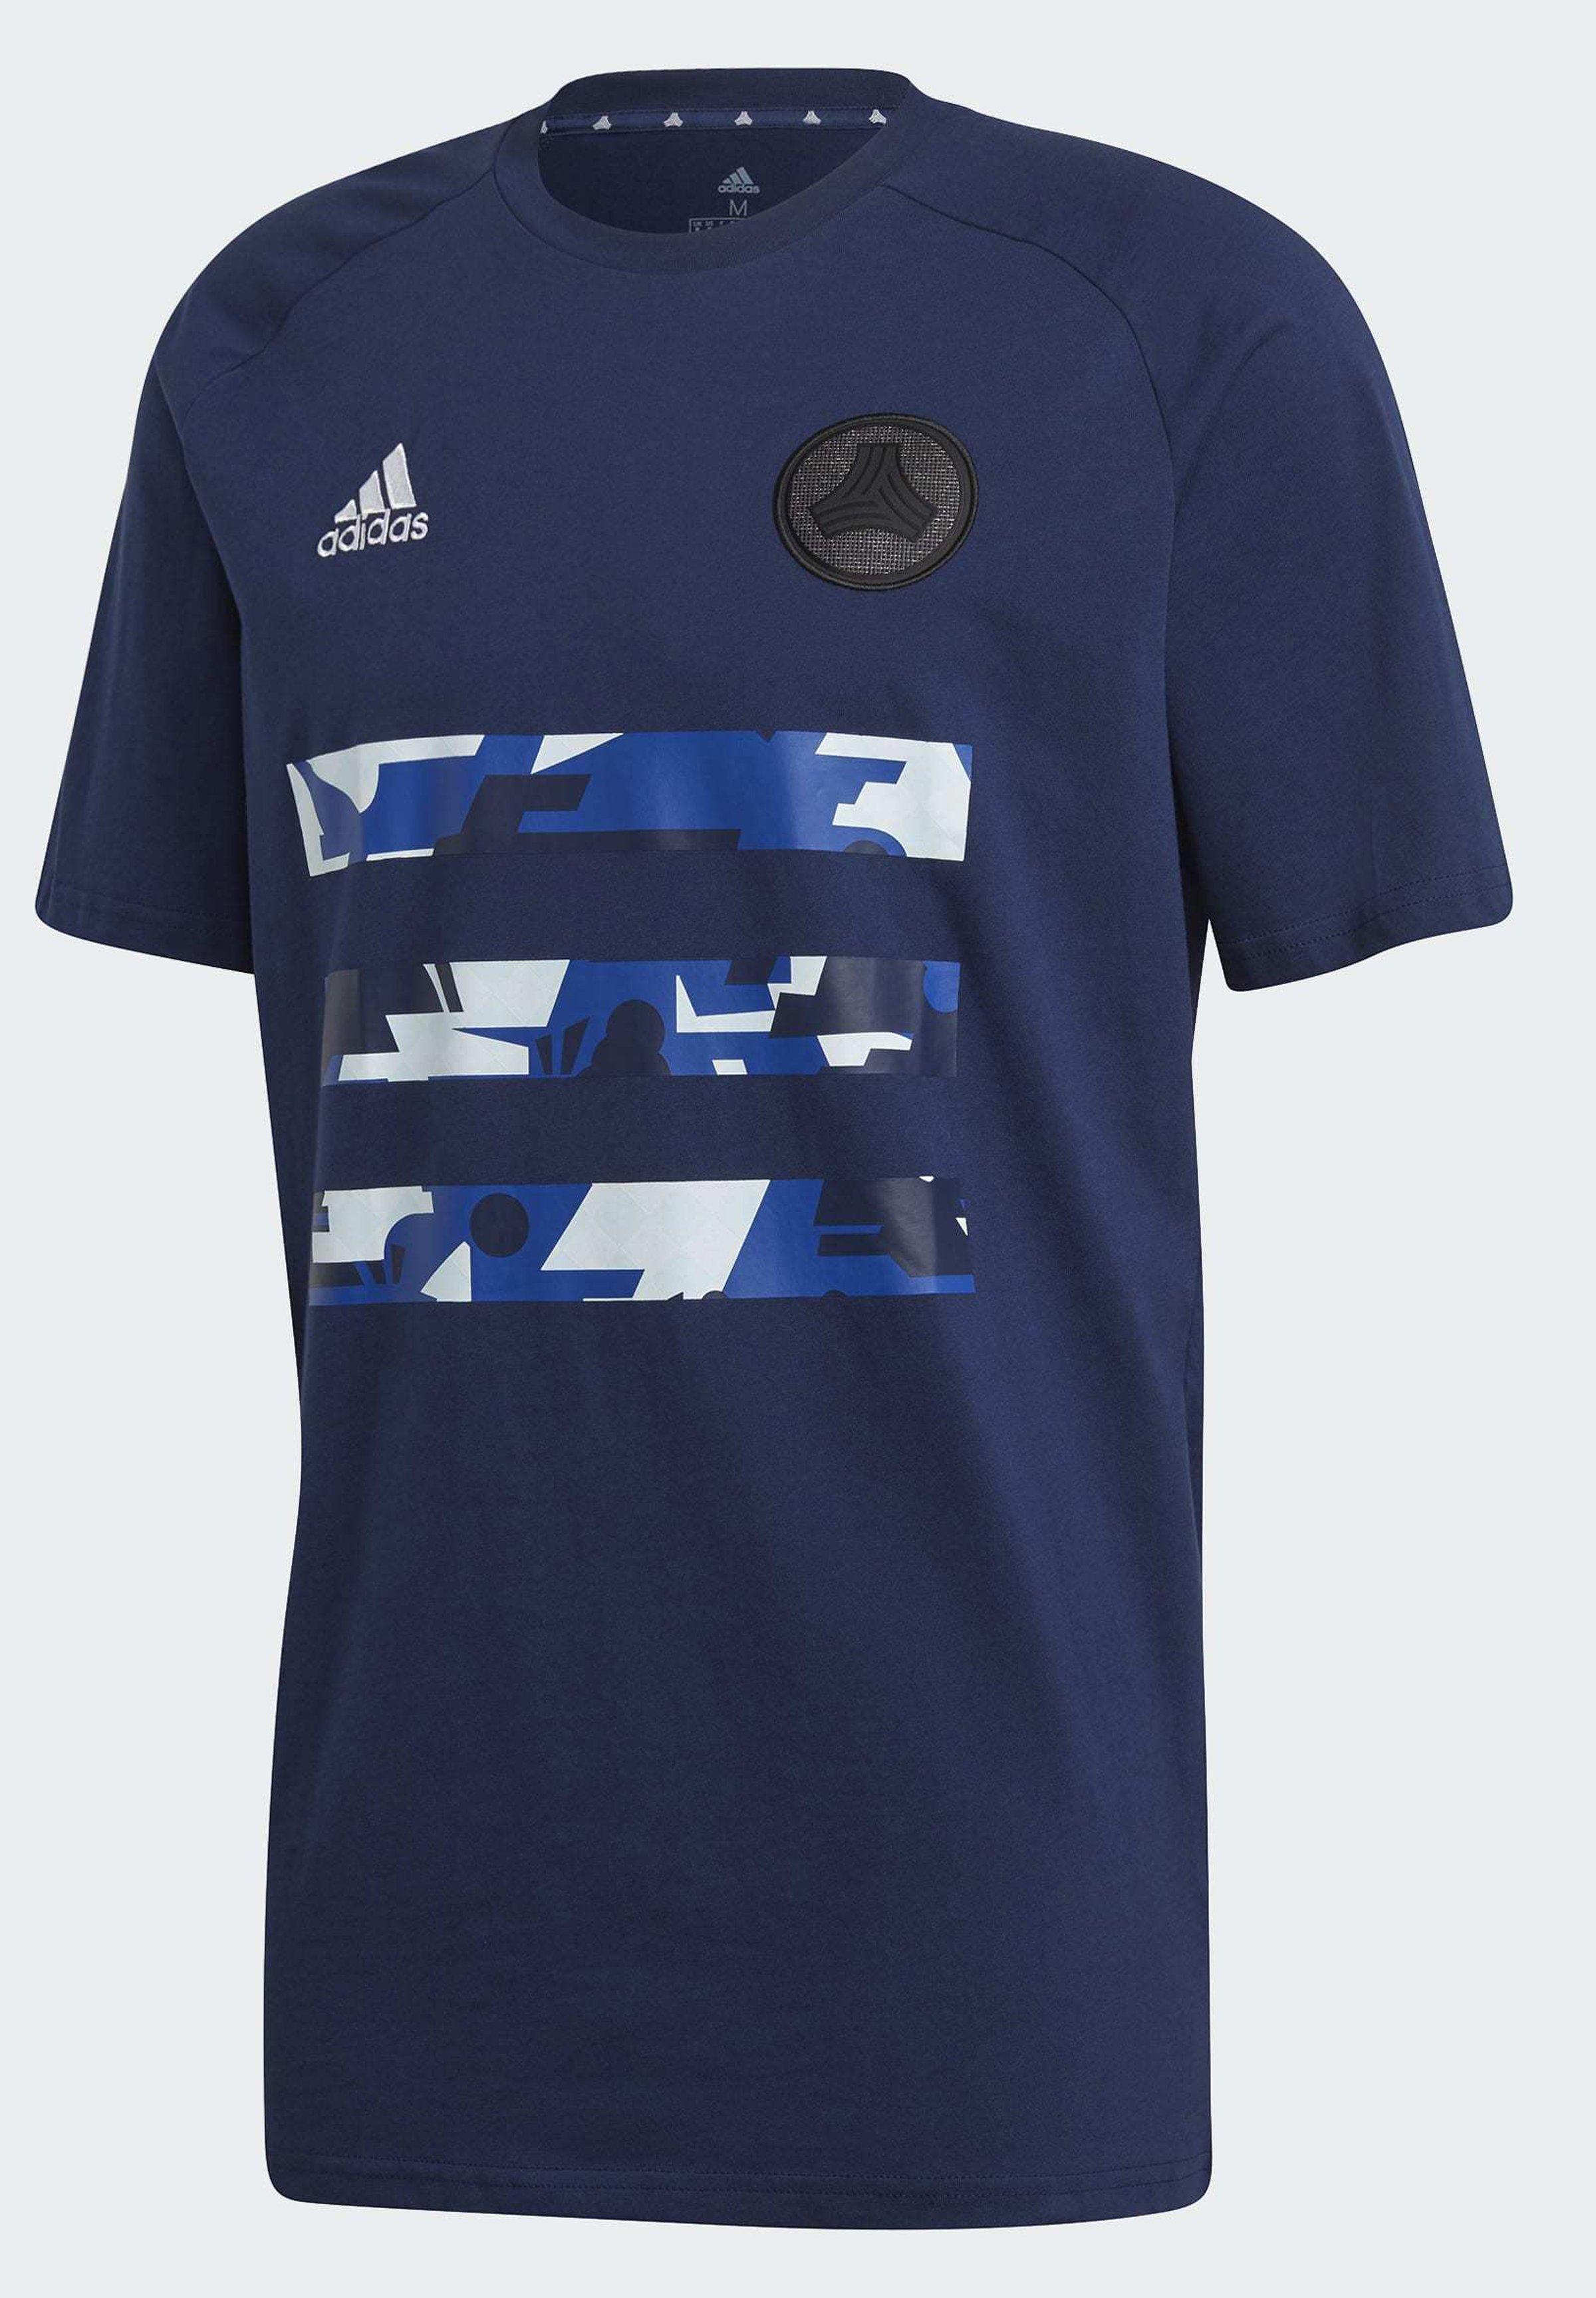 Adidas Performance Tee - T-shirts Med Print Navblu